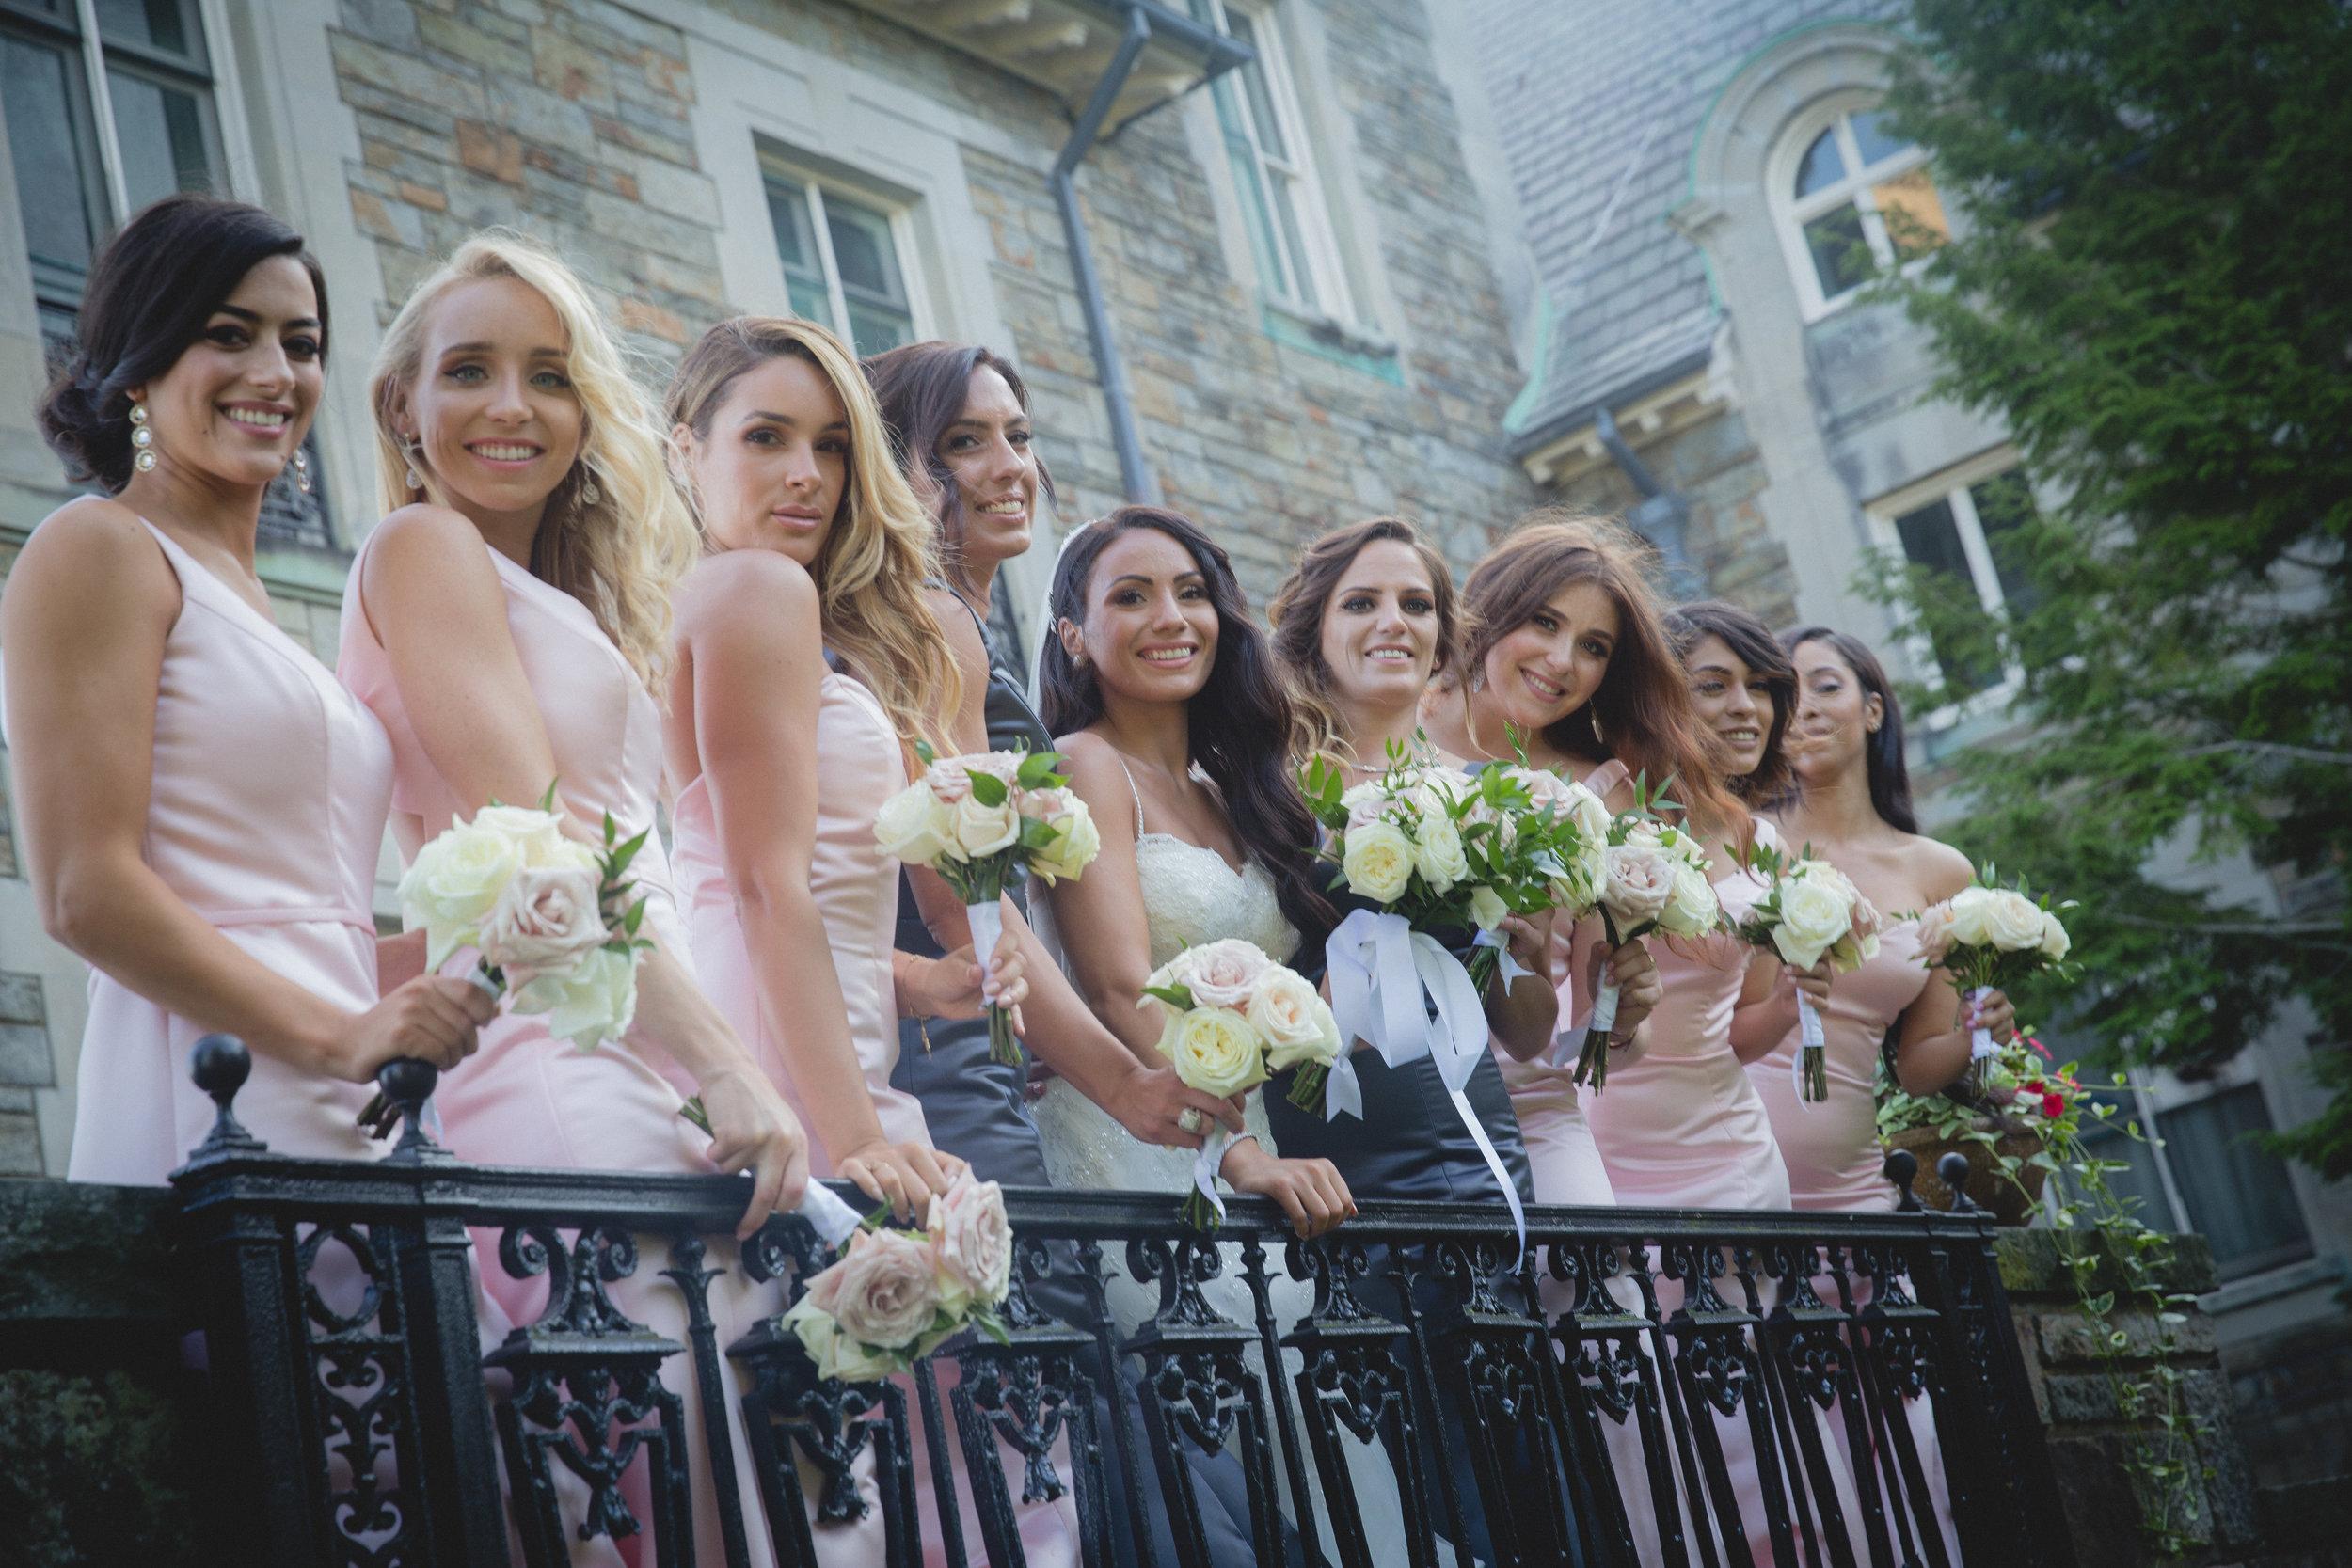 Dorothy and Michael, Destination Wedding, New England, The Aldrich Mansion, Warwick, Rhode Island, Wedding Photographer Videographer